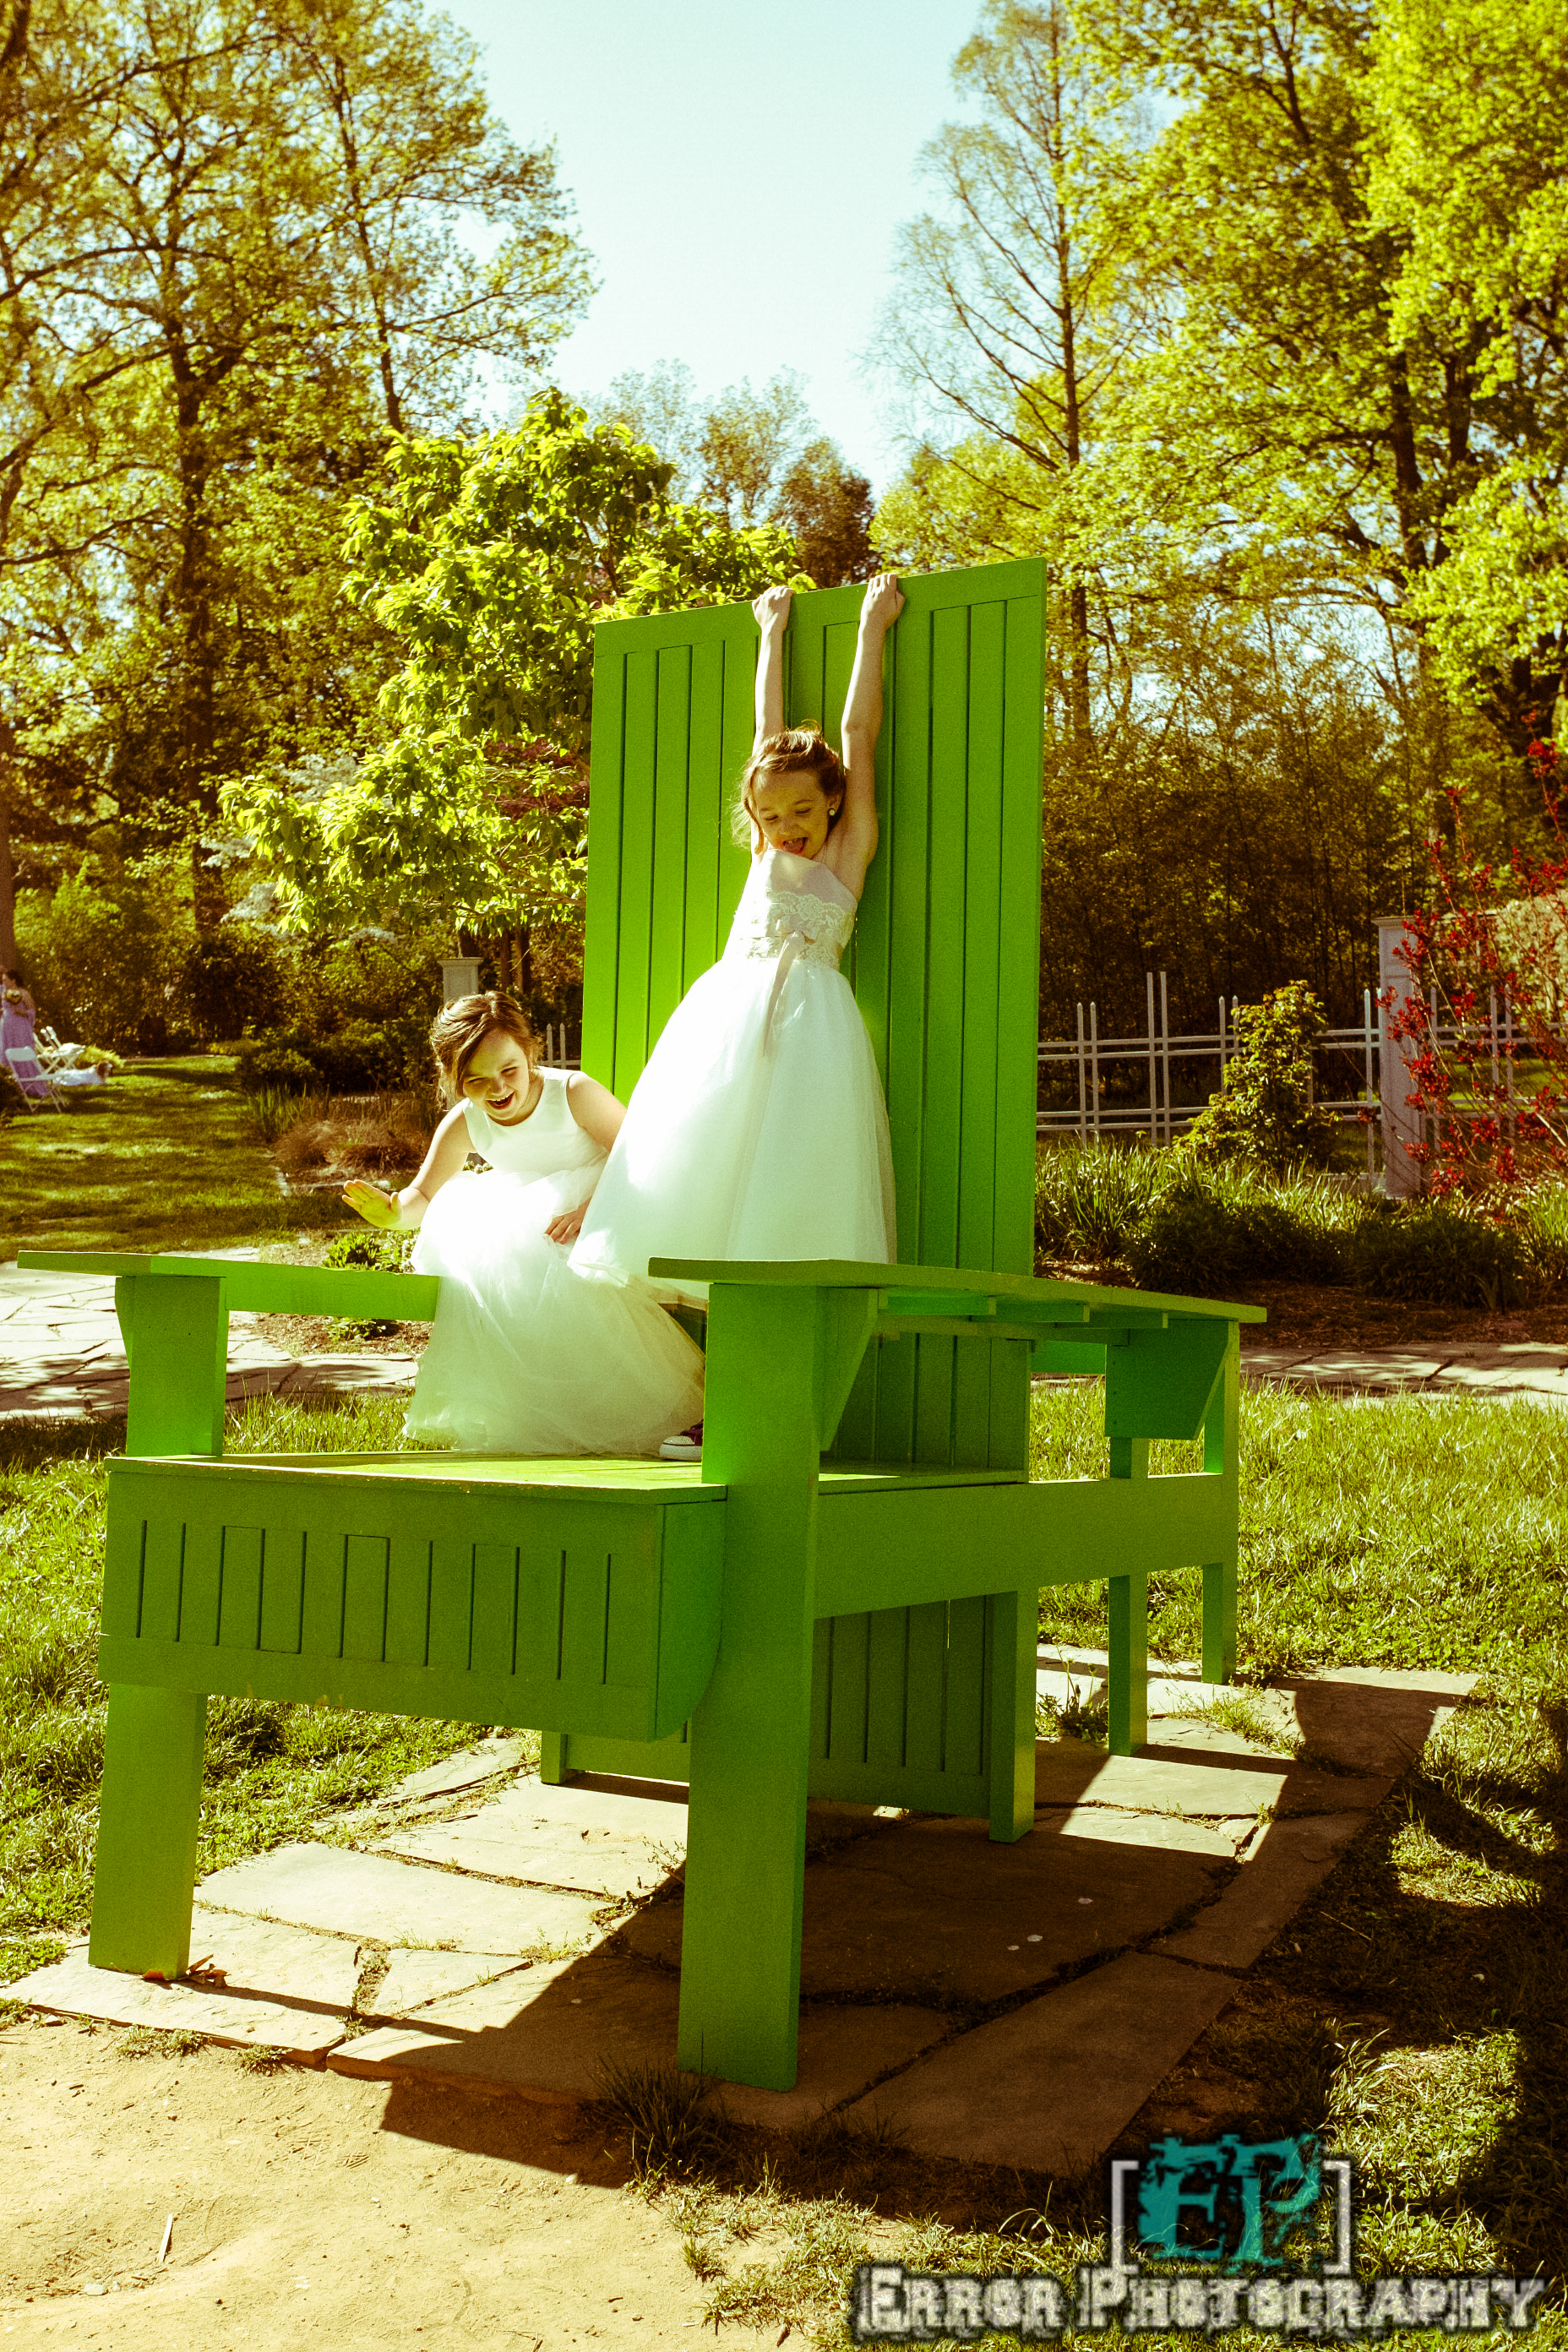 Wedding photos 5-4-13 Error Photography wm-16.jpg